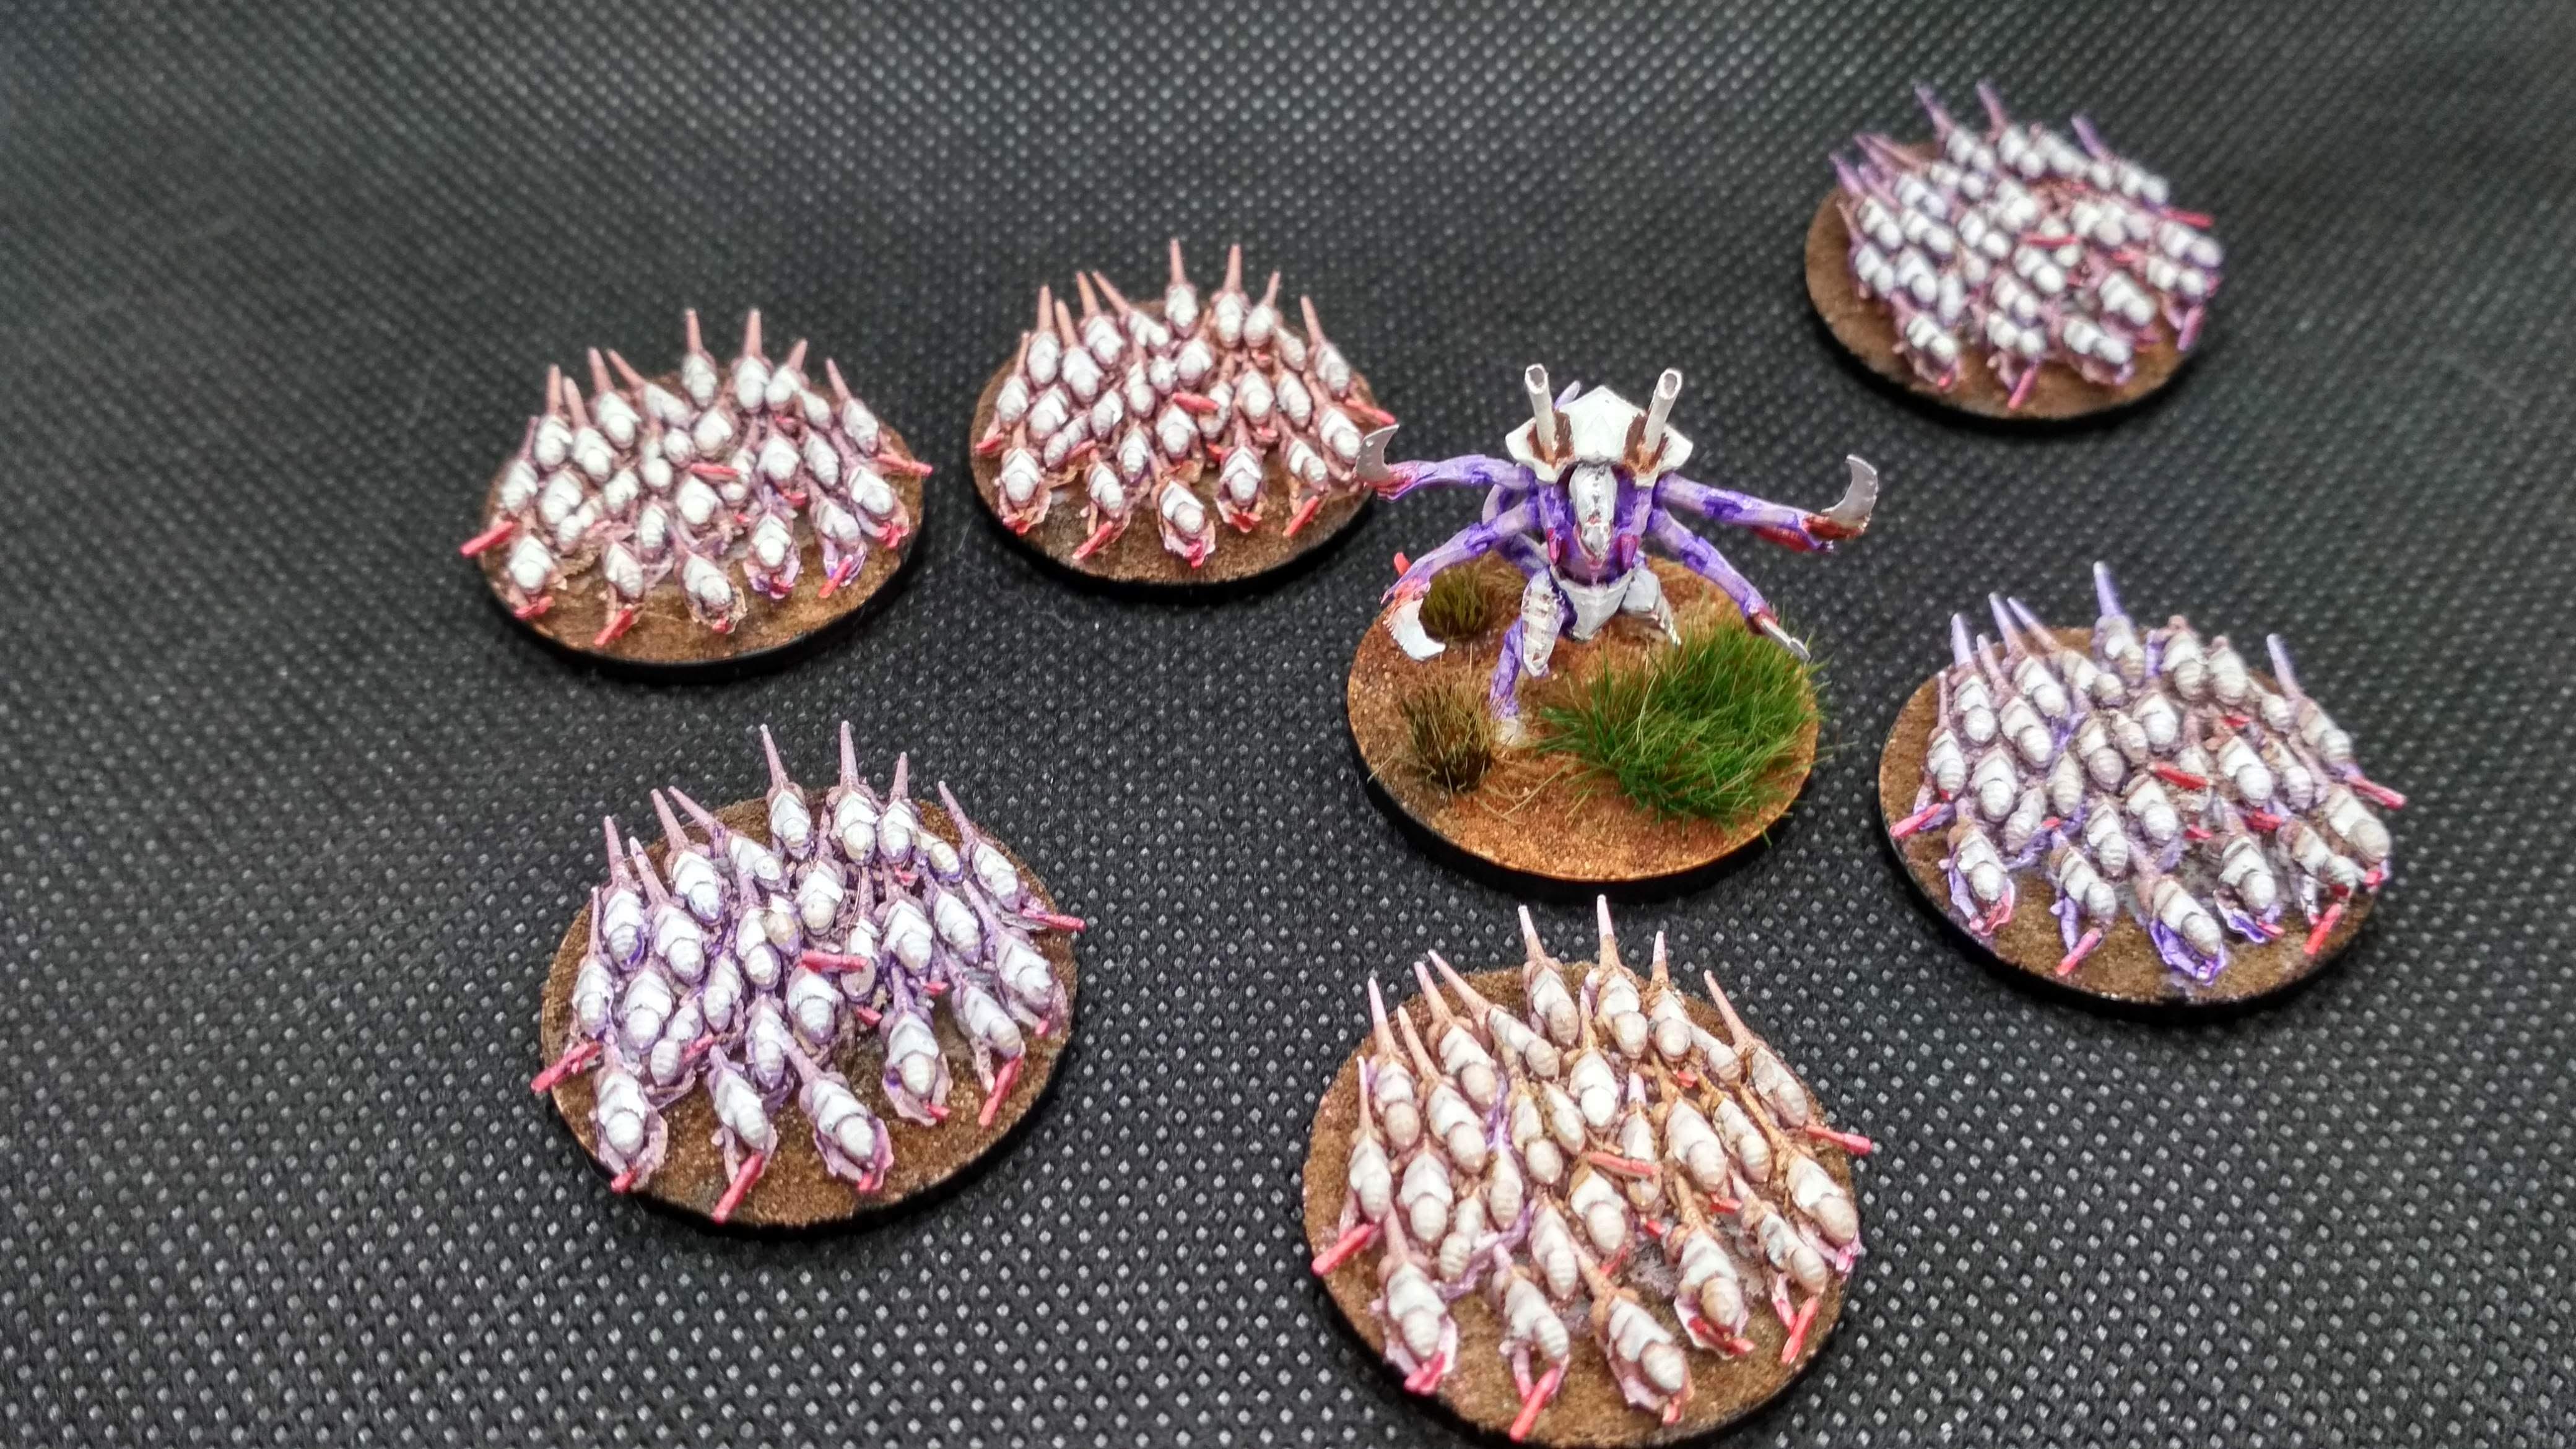 Epic armageddon tyranid infinite swarm